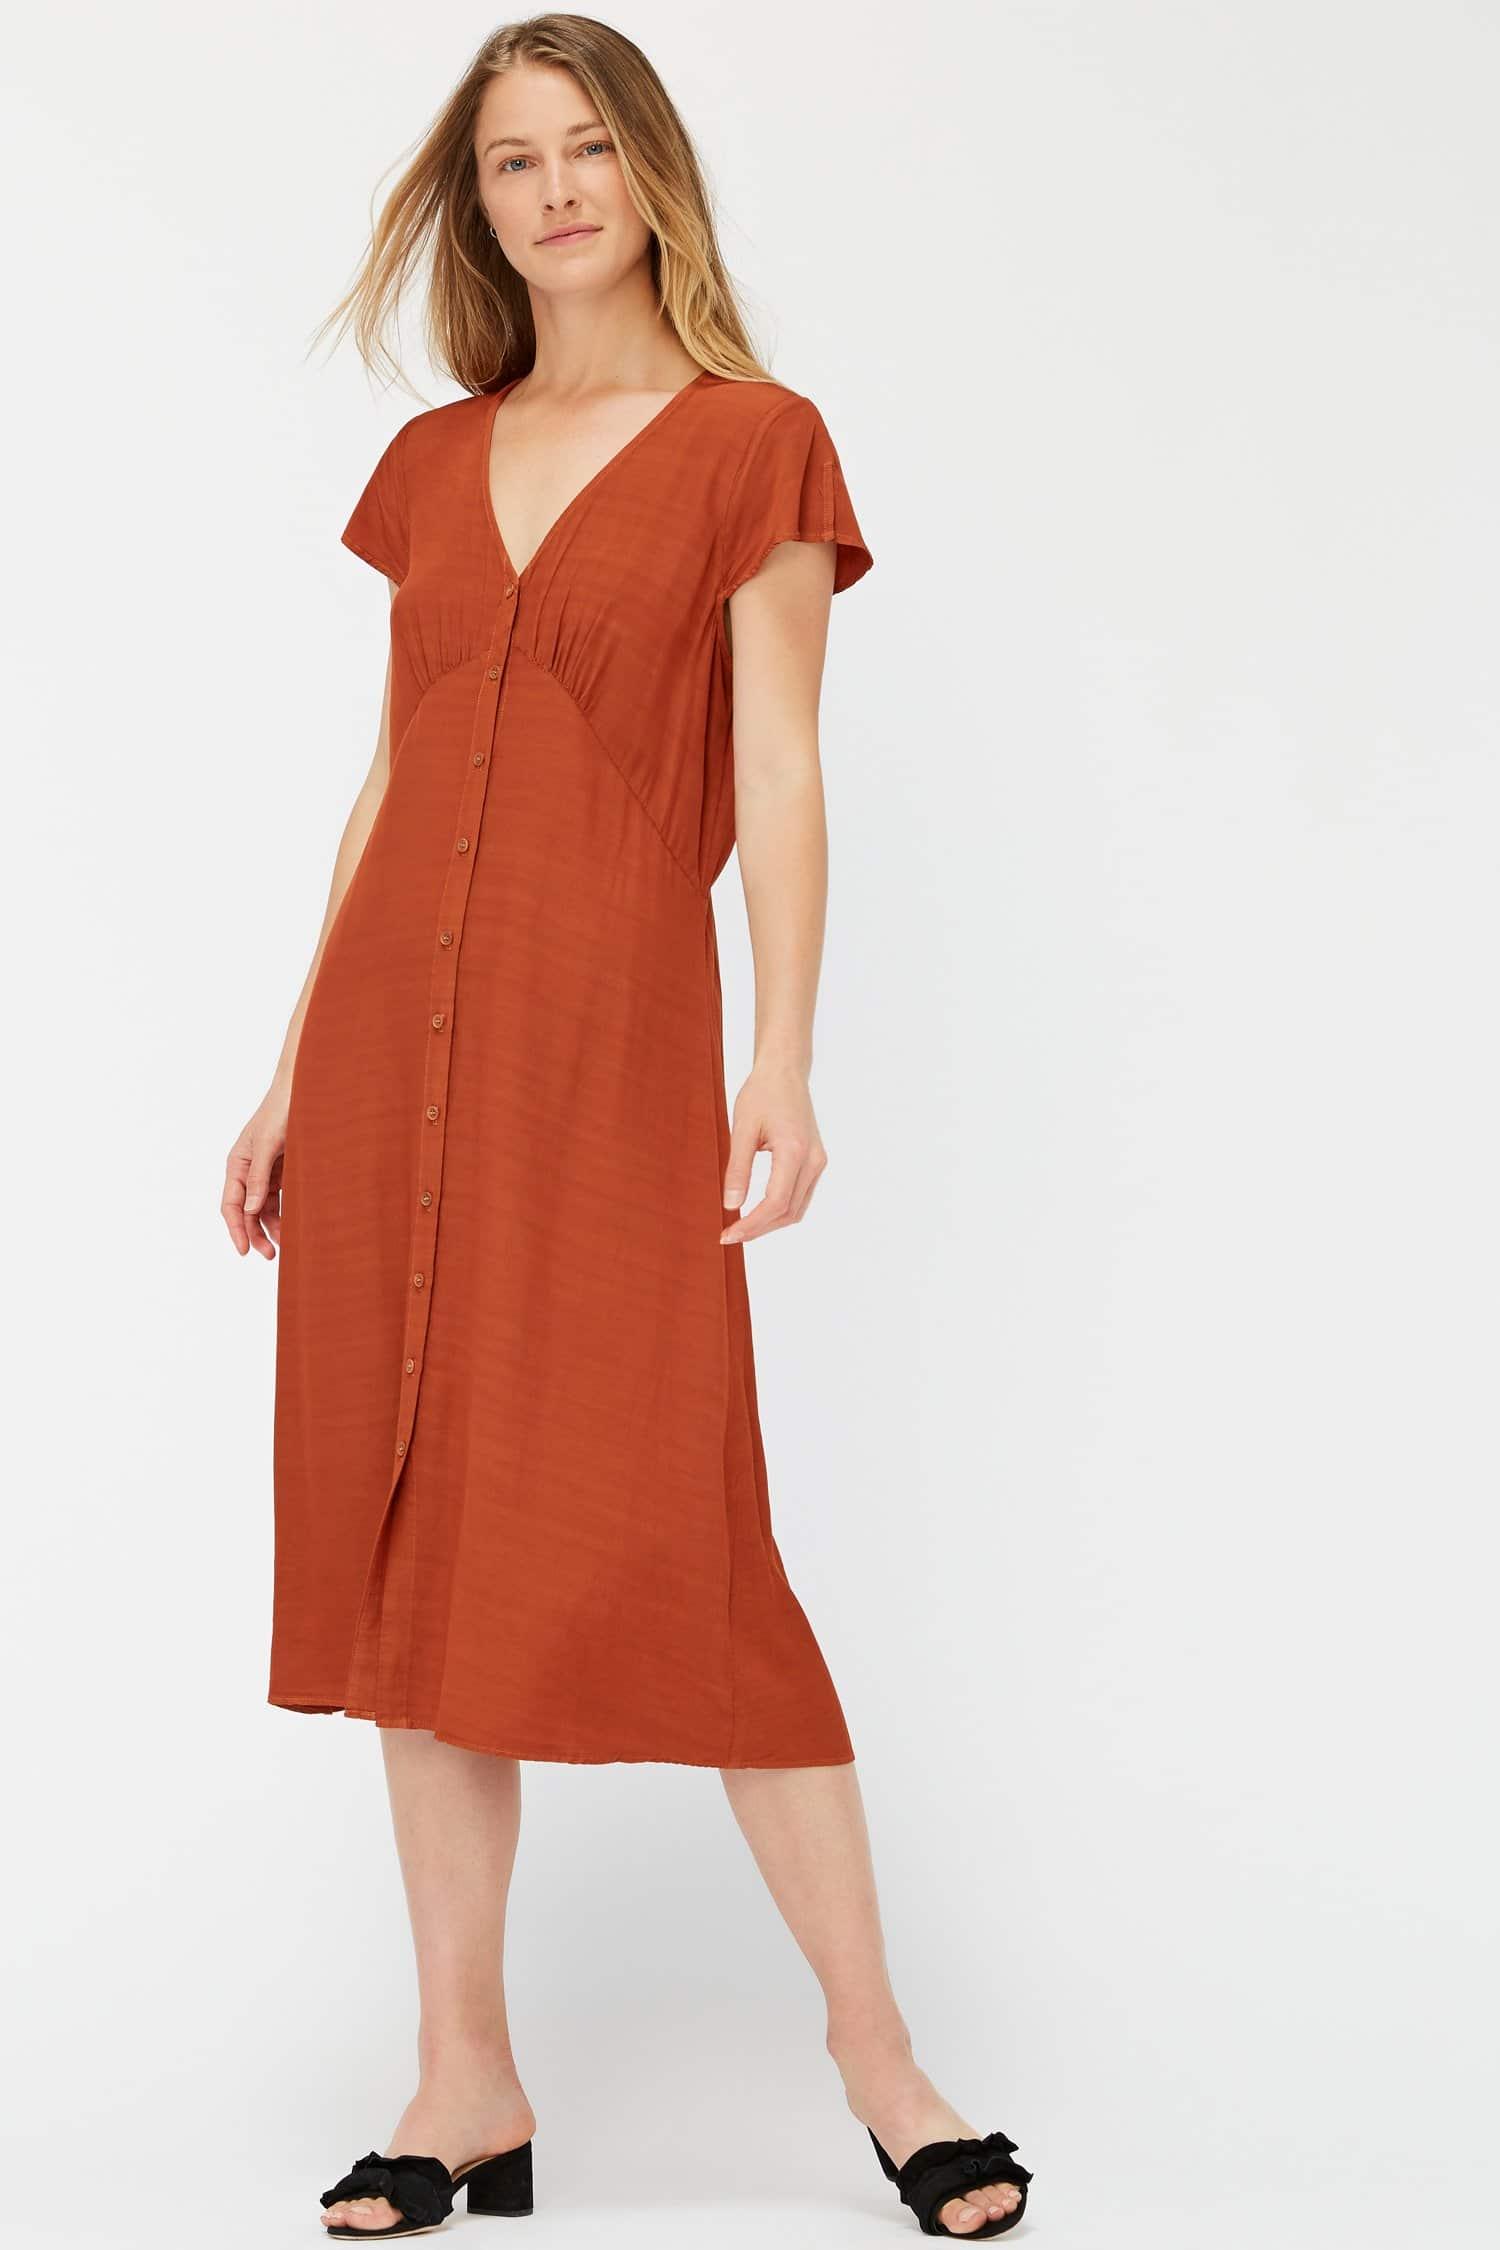 Melody Dress LACAUSA